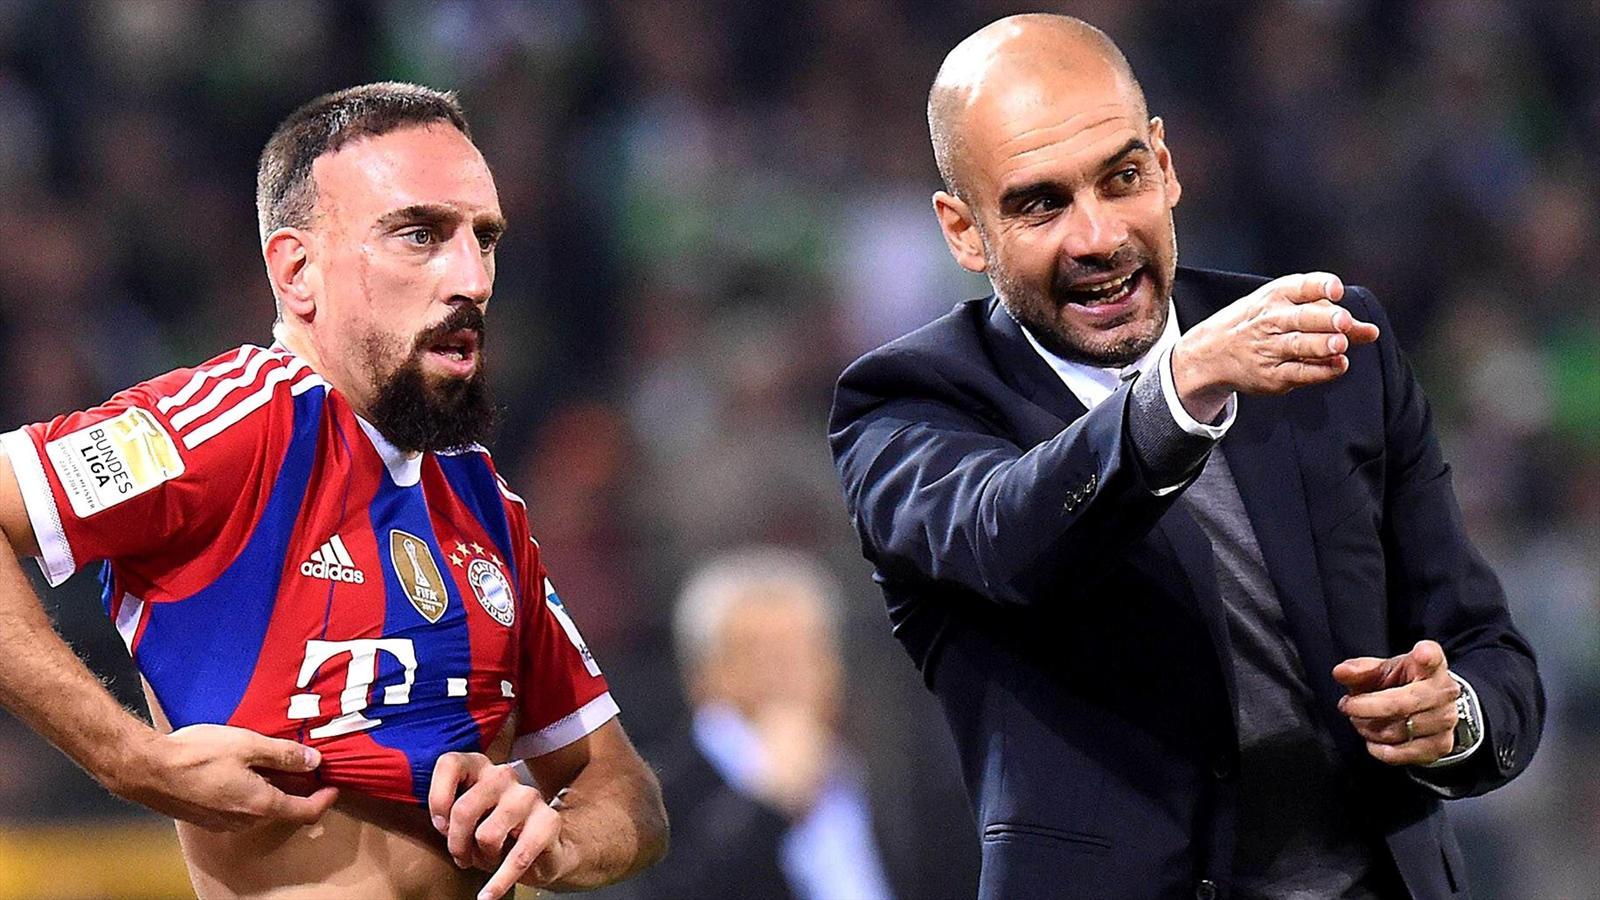 Franck Ribery: Louis van Gaal is an uncaring 'bad man' - Bundesliga 2011-2012 - Football - Eurosport Asia